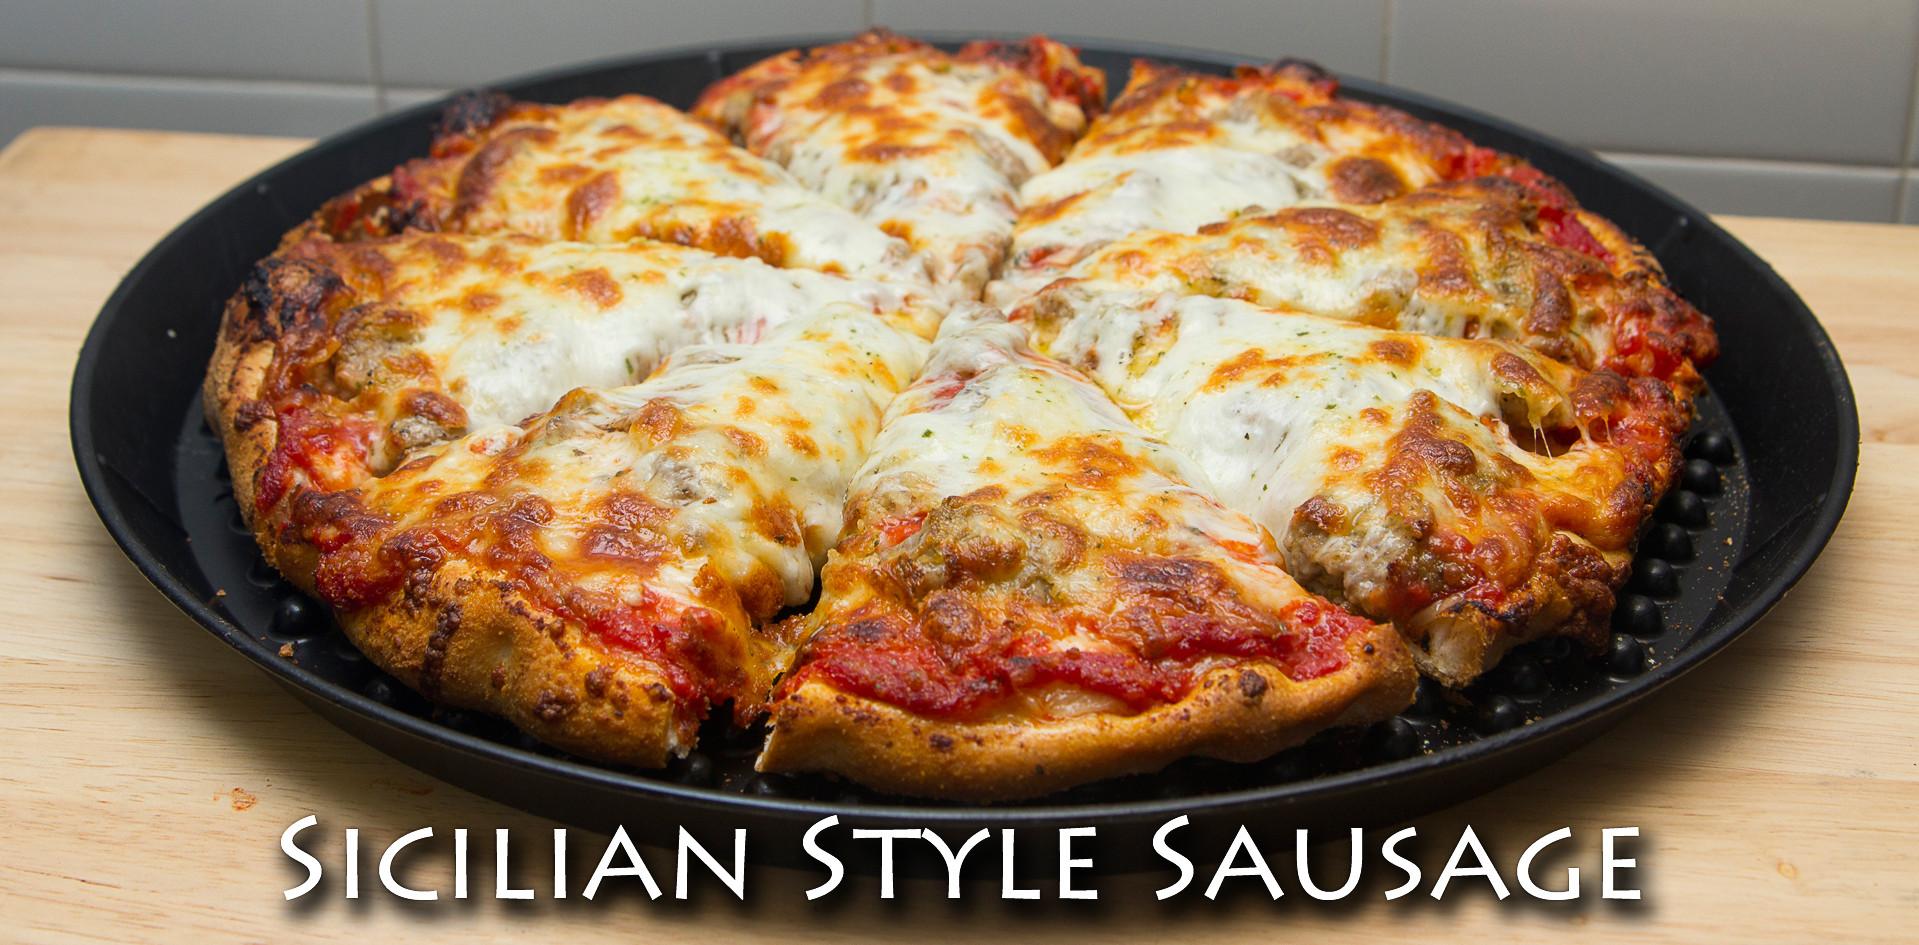 Sicilian Style Sausage Pizza